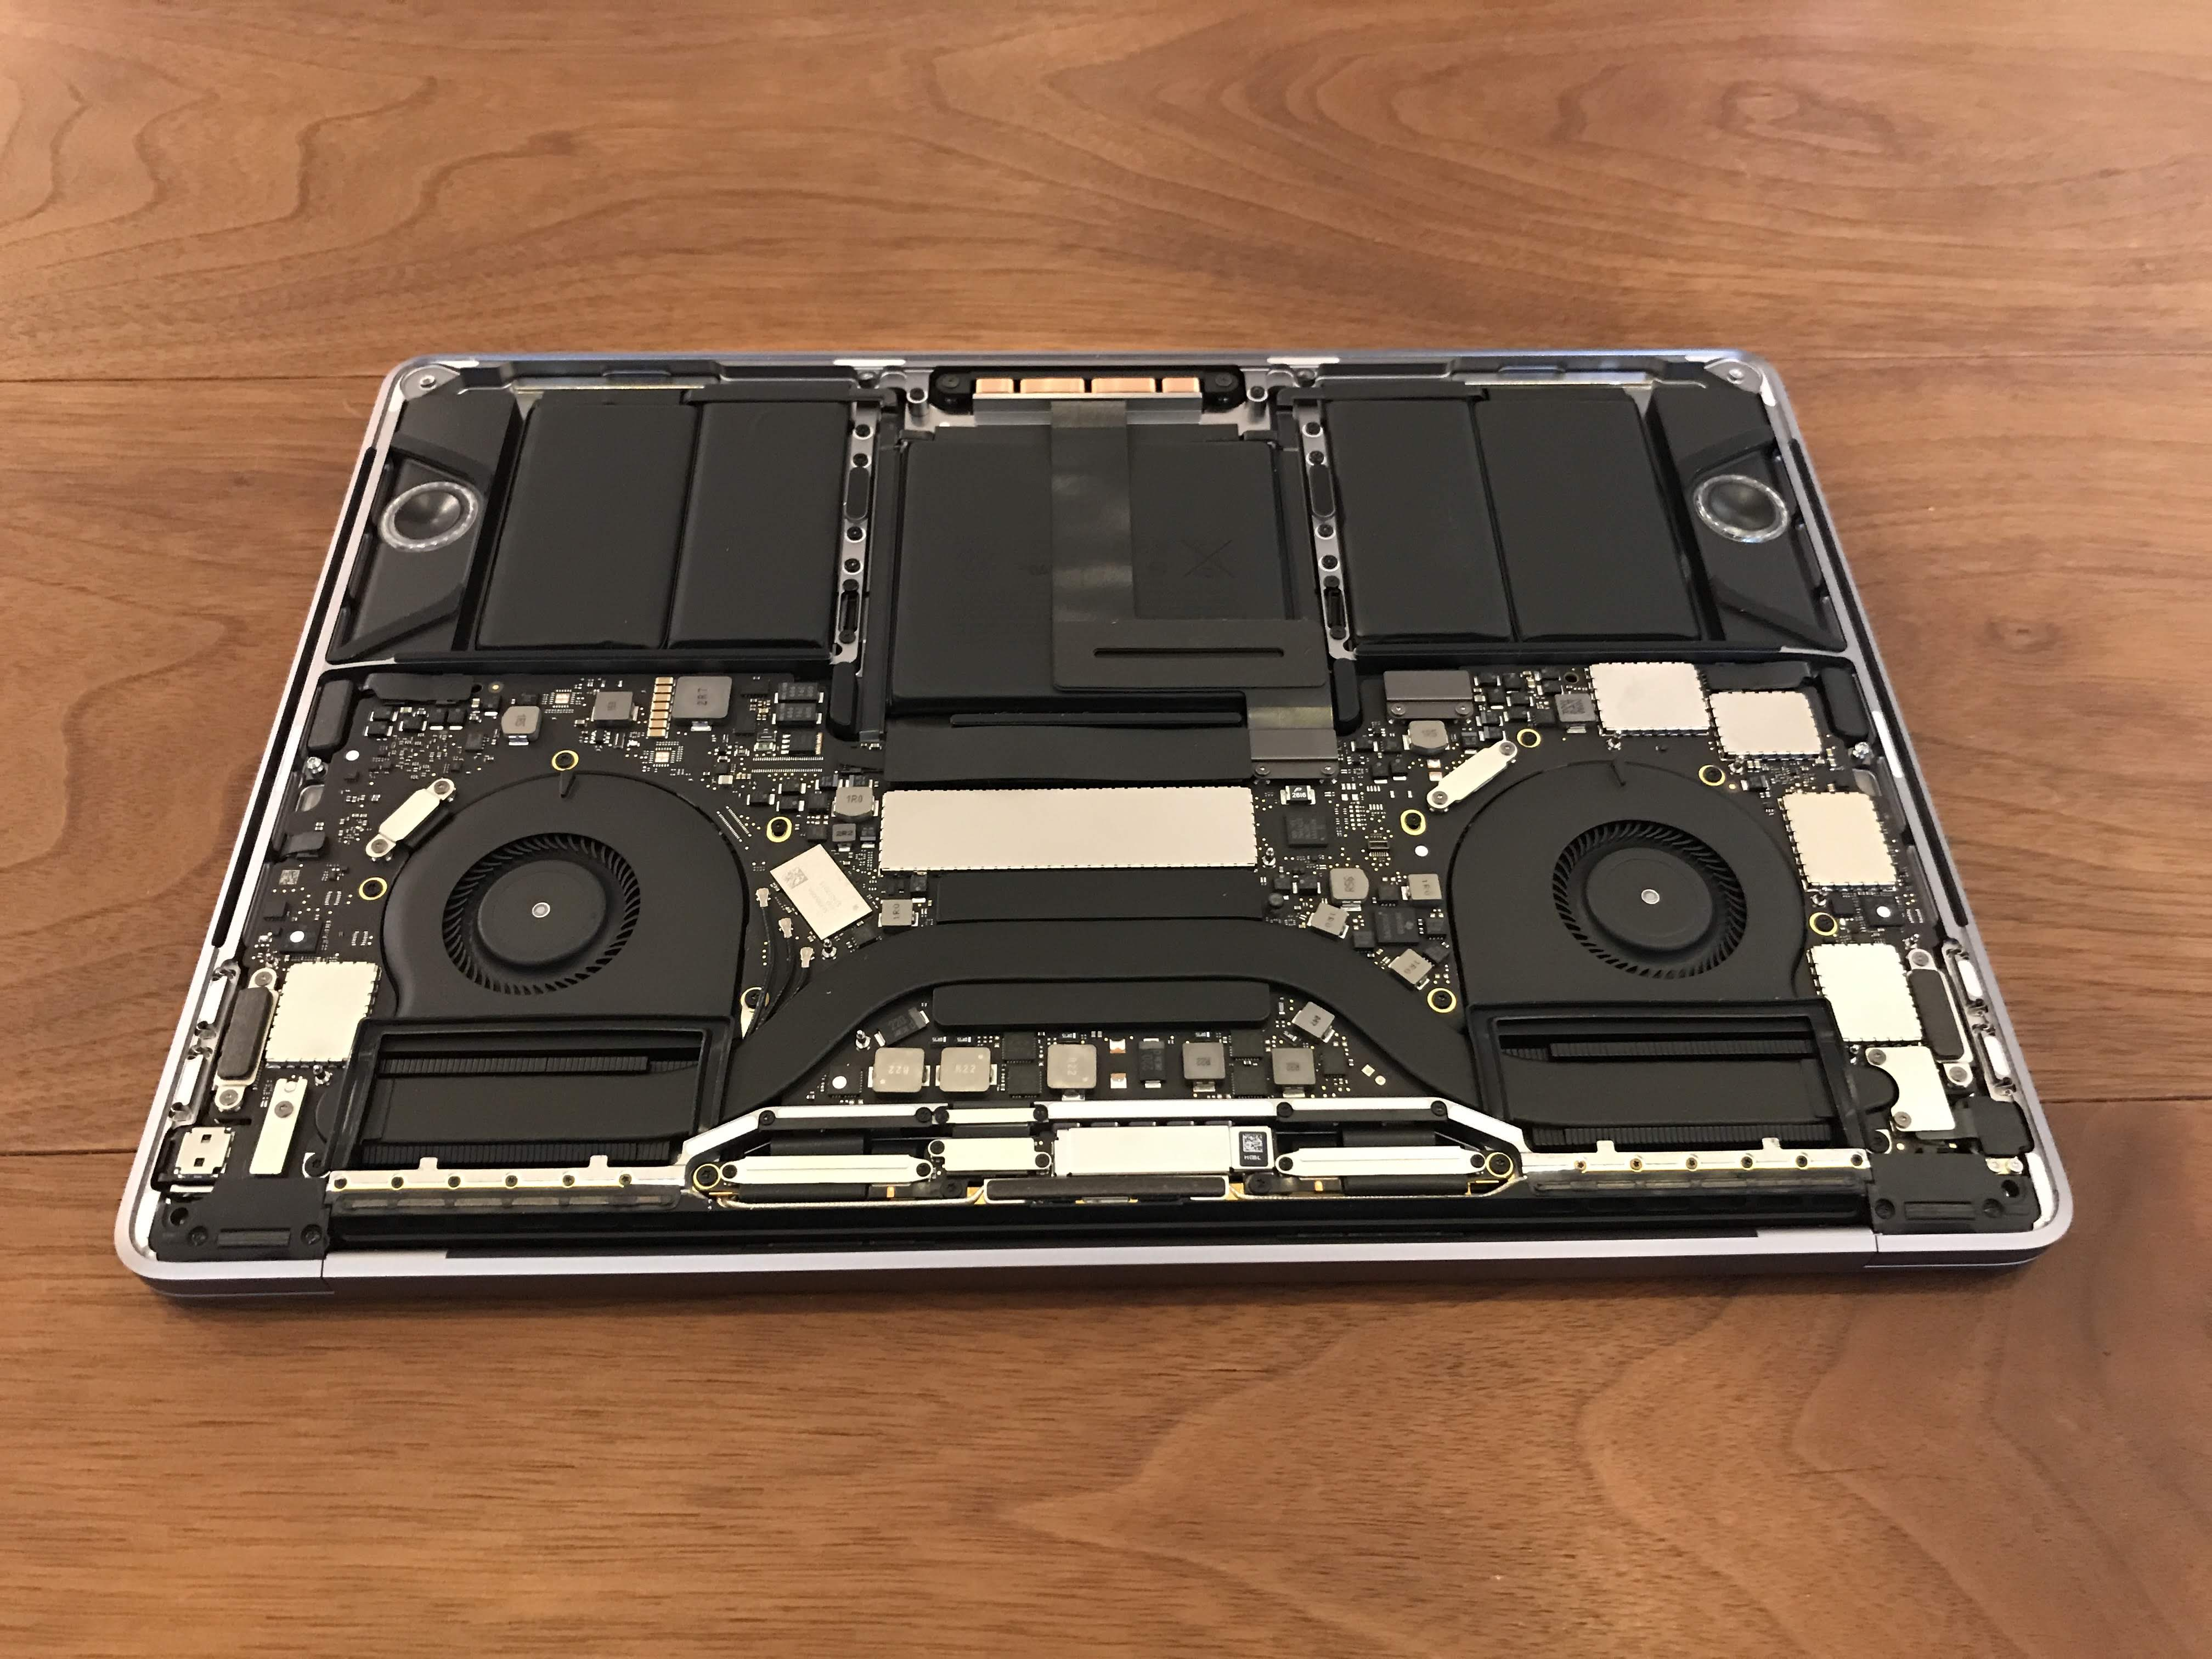 MacBook Proの裏蓋を外した状態